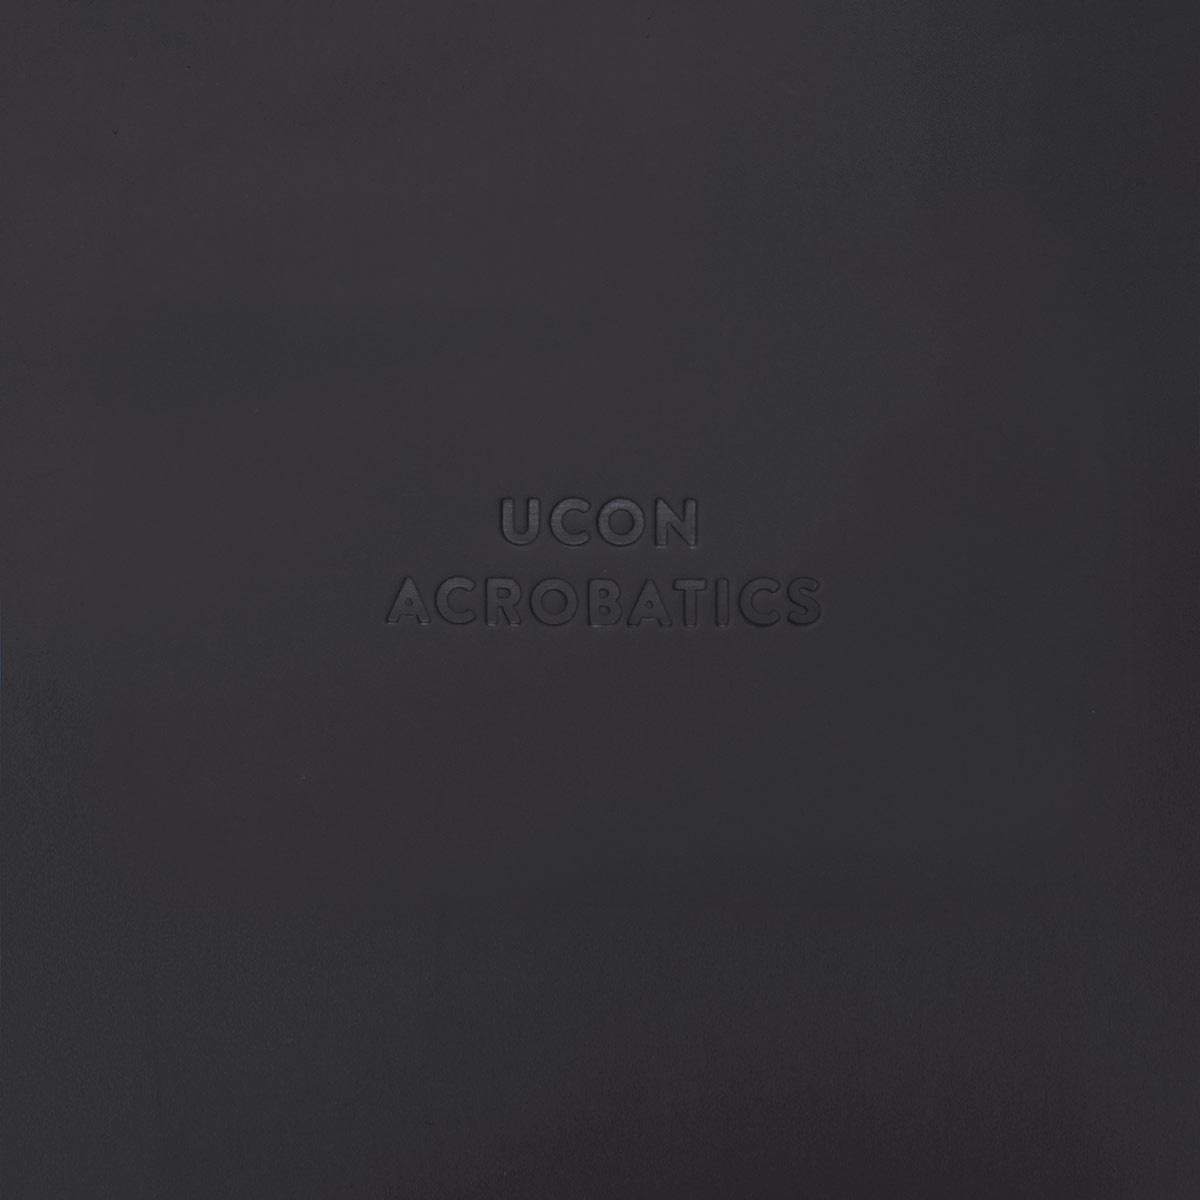 Ucon  Acrobatics  HAJO MINI BACKPACK  Lotus Series black